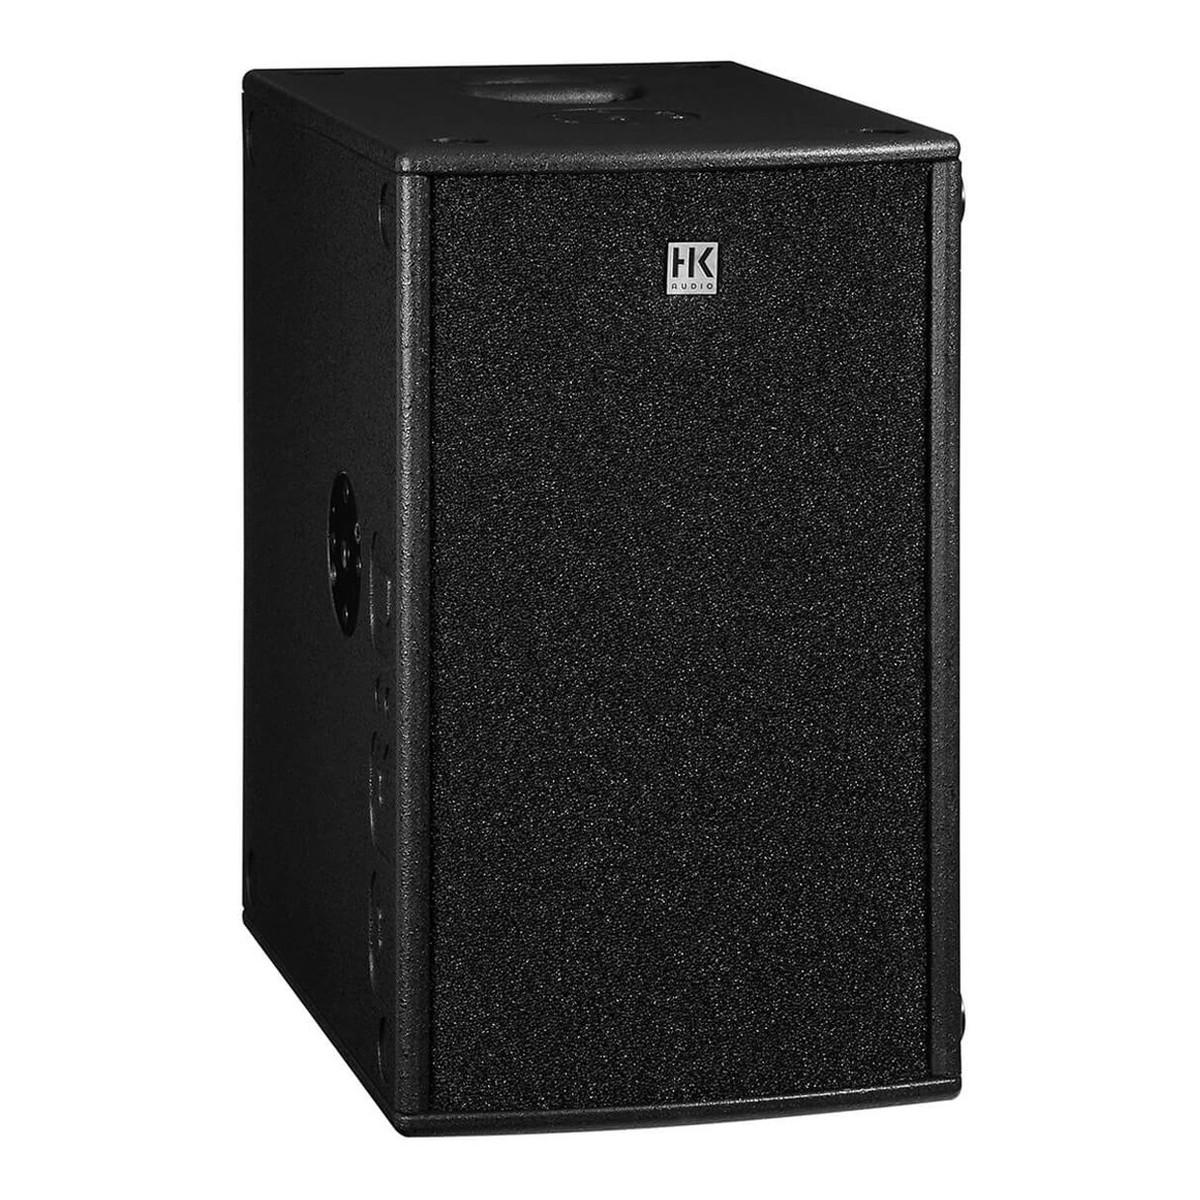 hk audio premium pr o 210 s 2 x 10 39 39 passive subwoofer. Black Bedroom Furniture Sets. Home Design Ideas